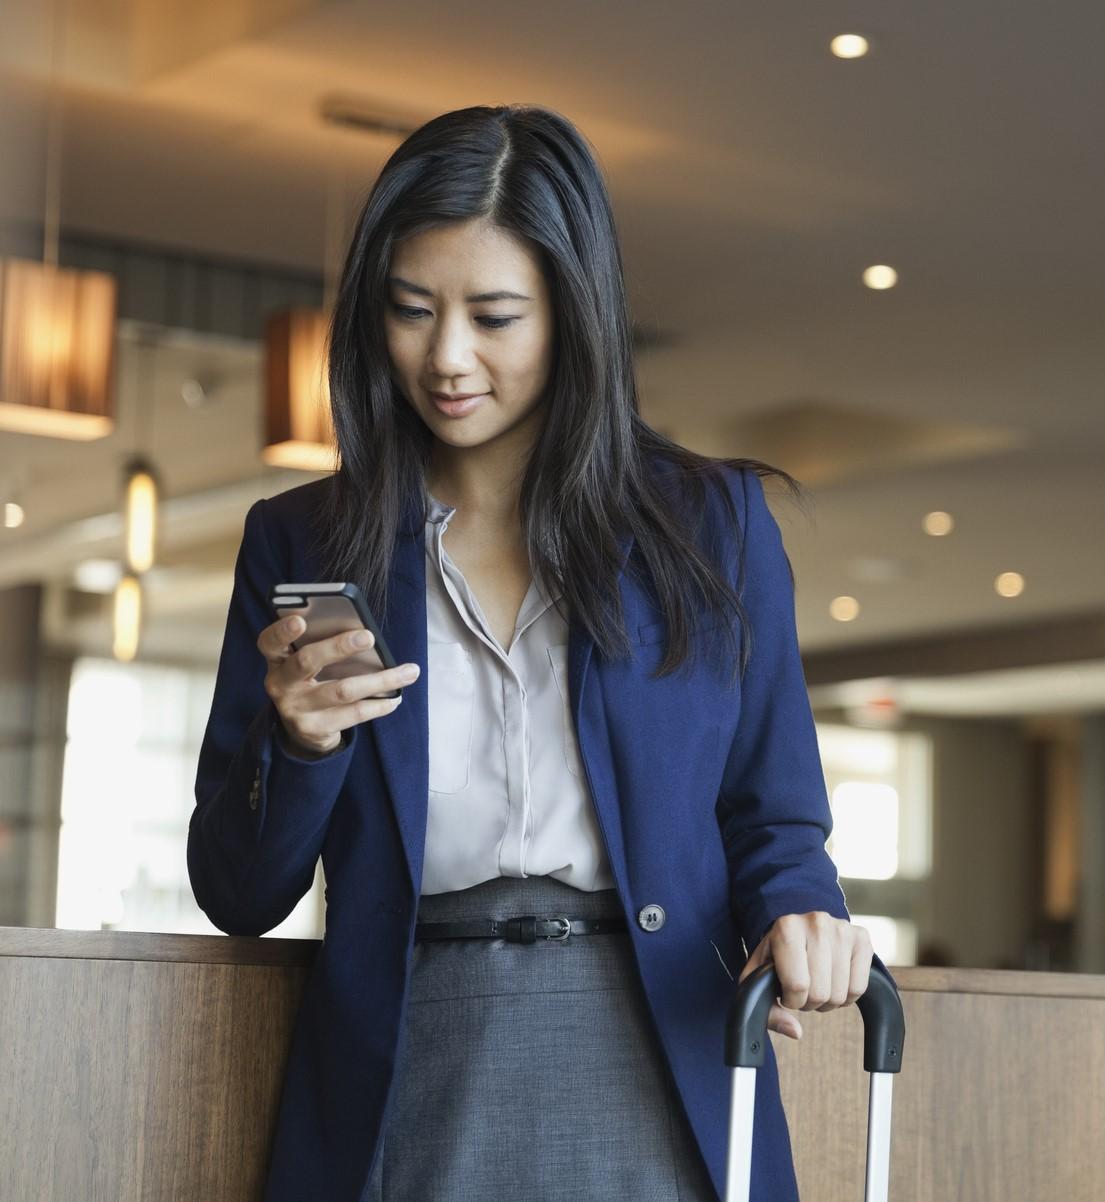 Businesswoman using smart phone in hotel lobby